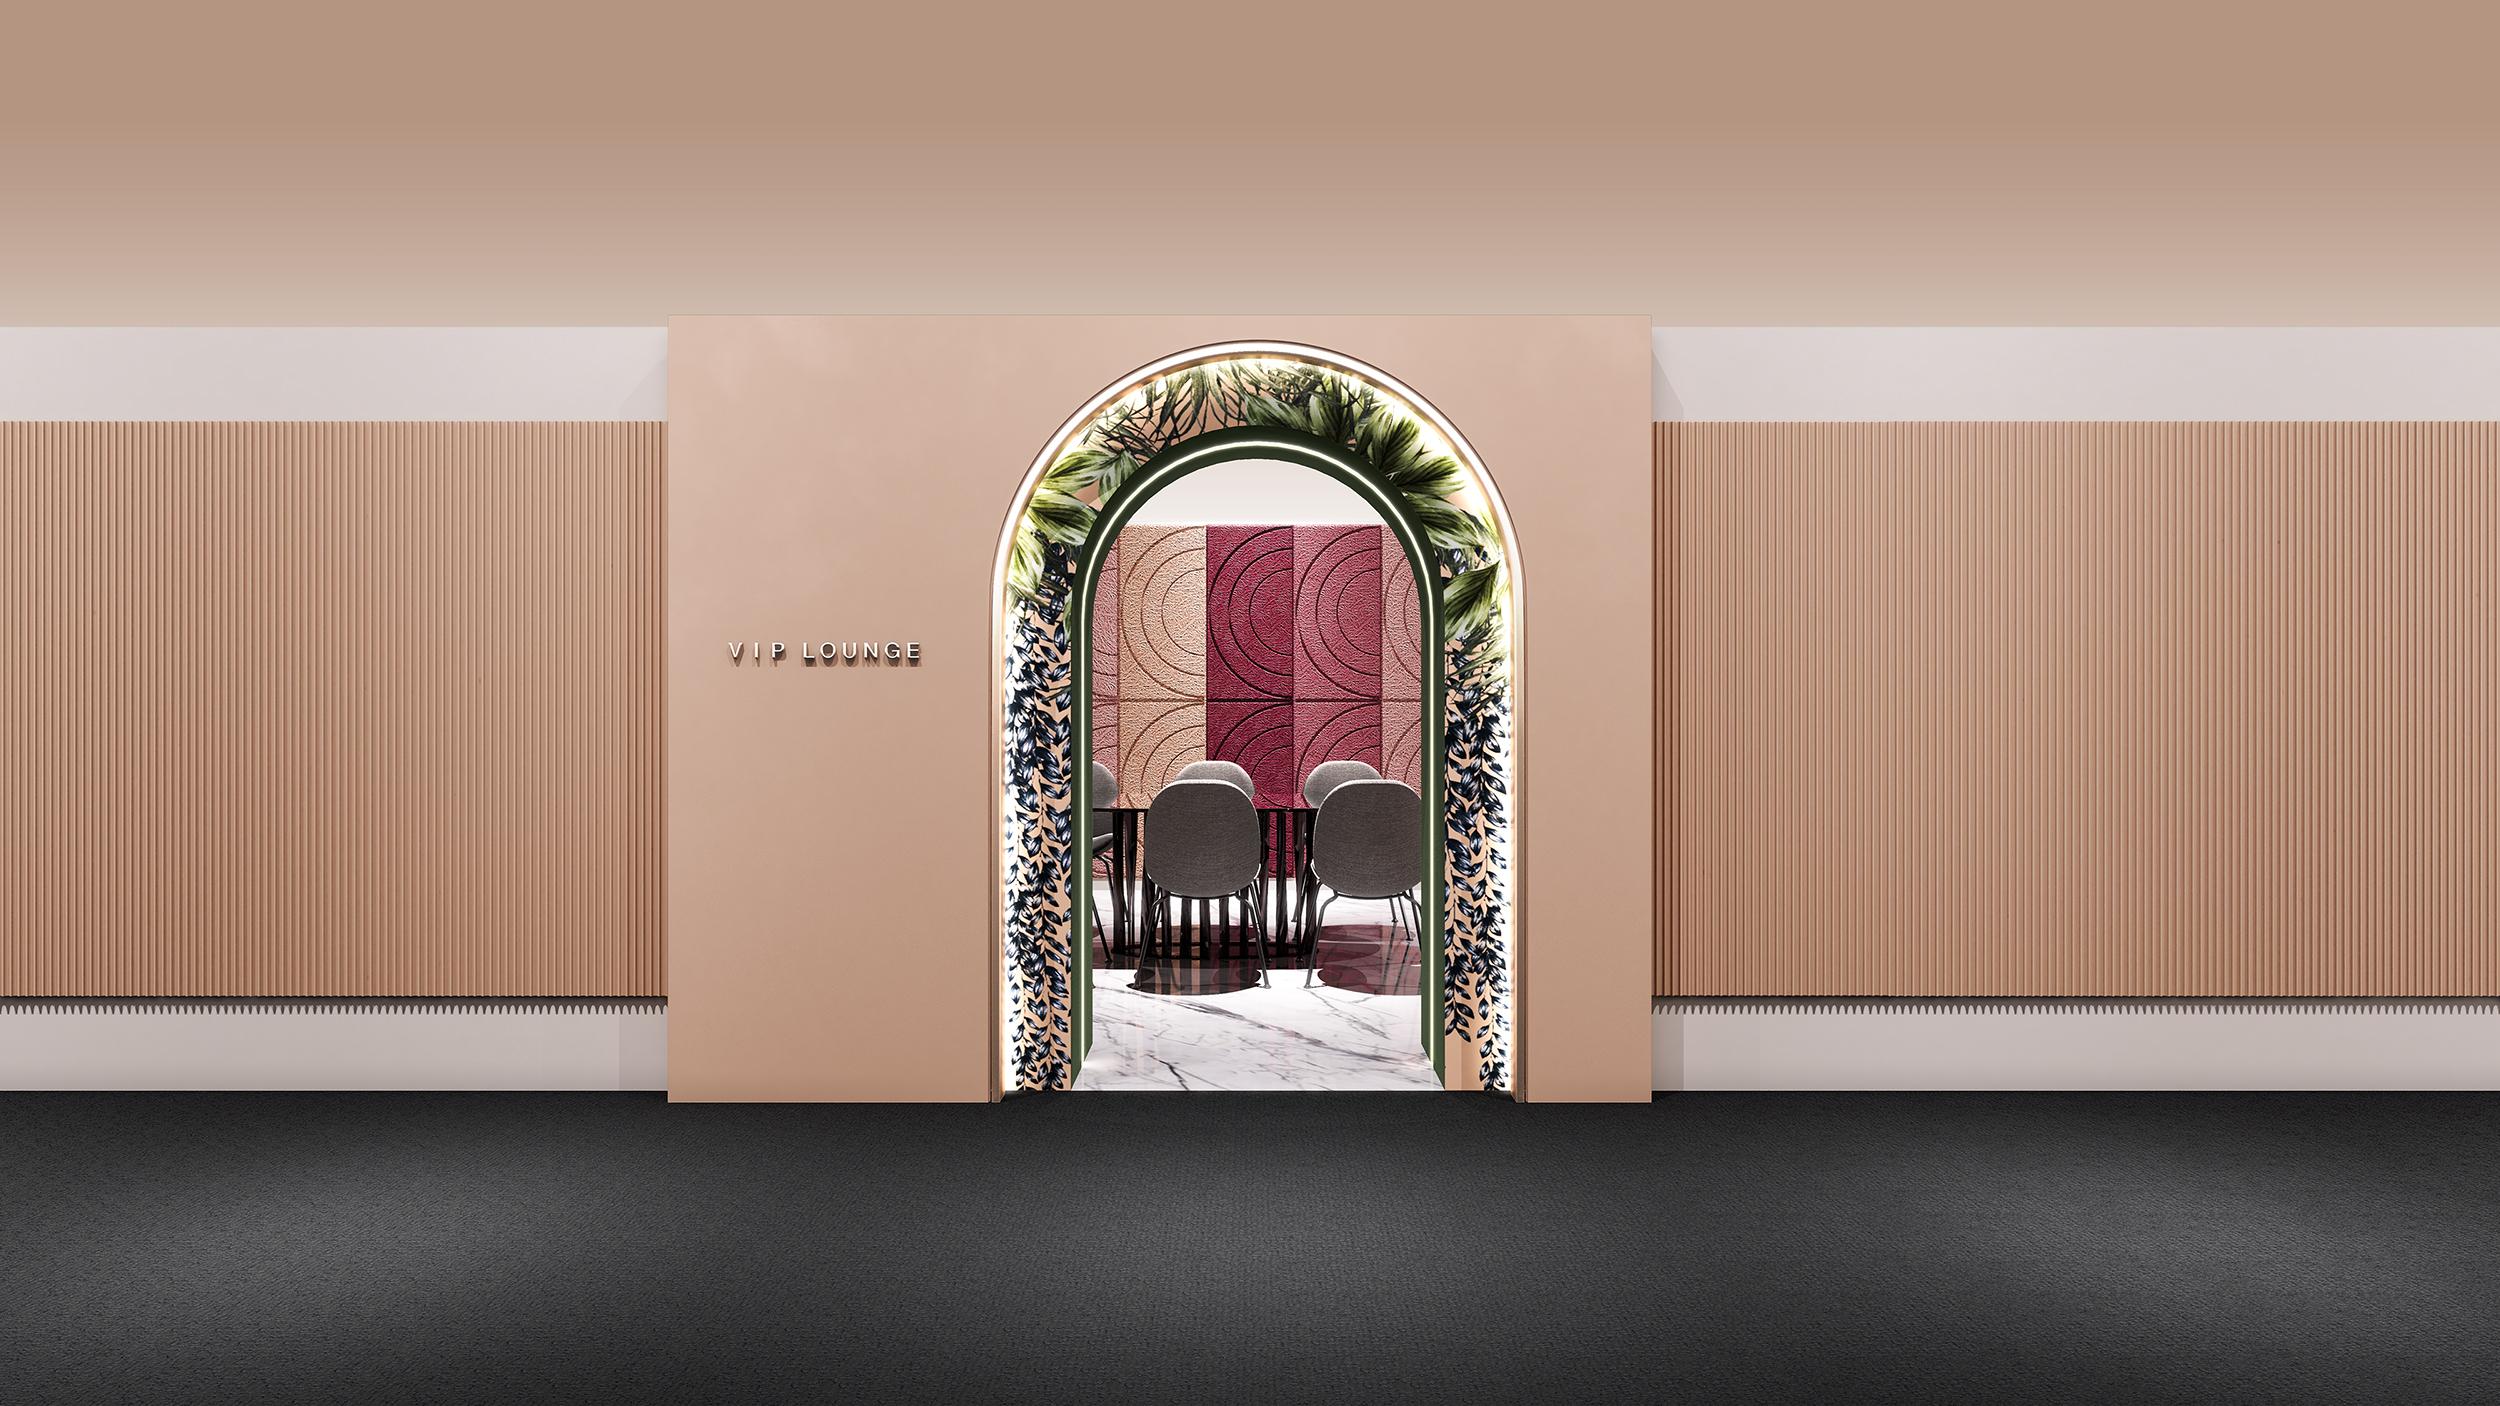 ids, vancouver, vip lounge, interior design show, 2019